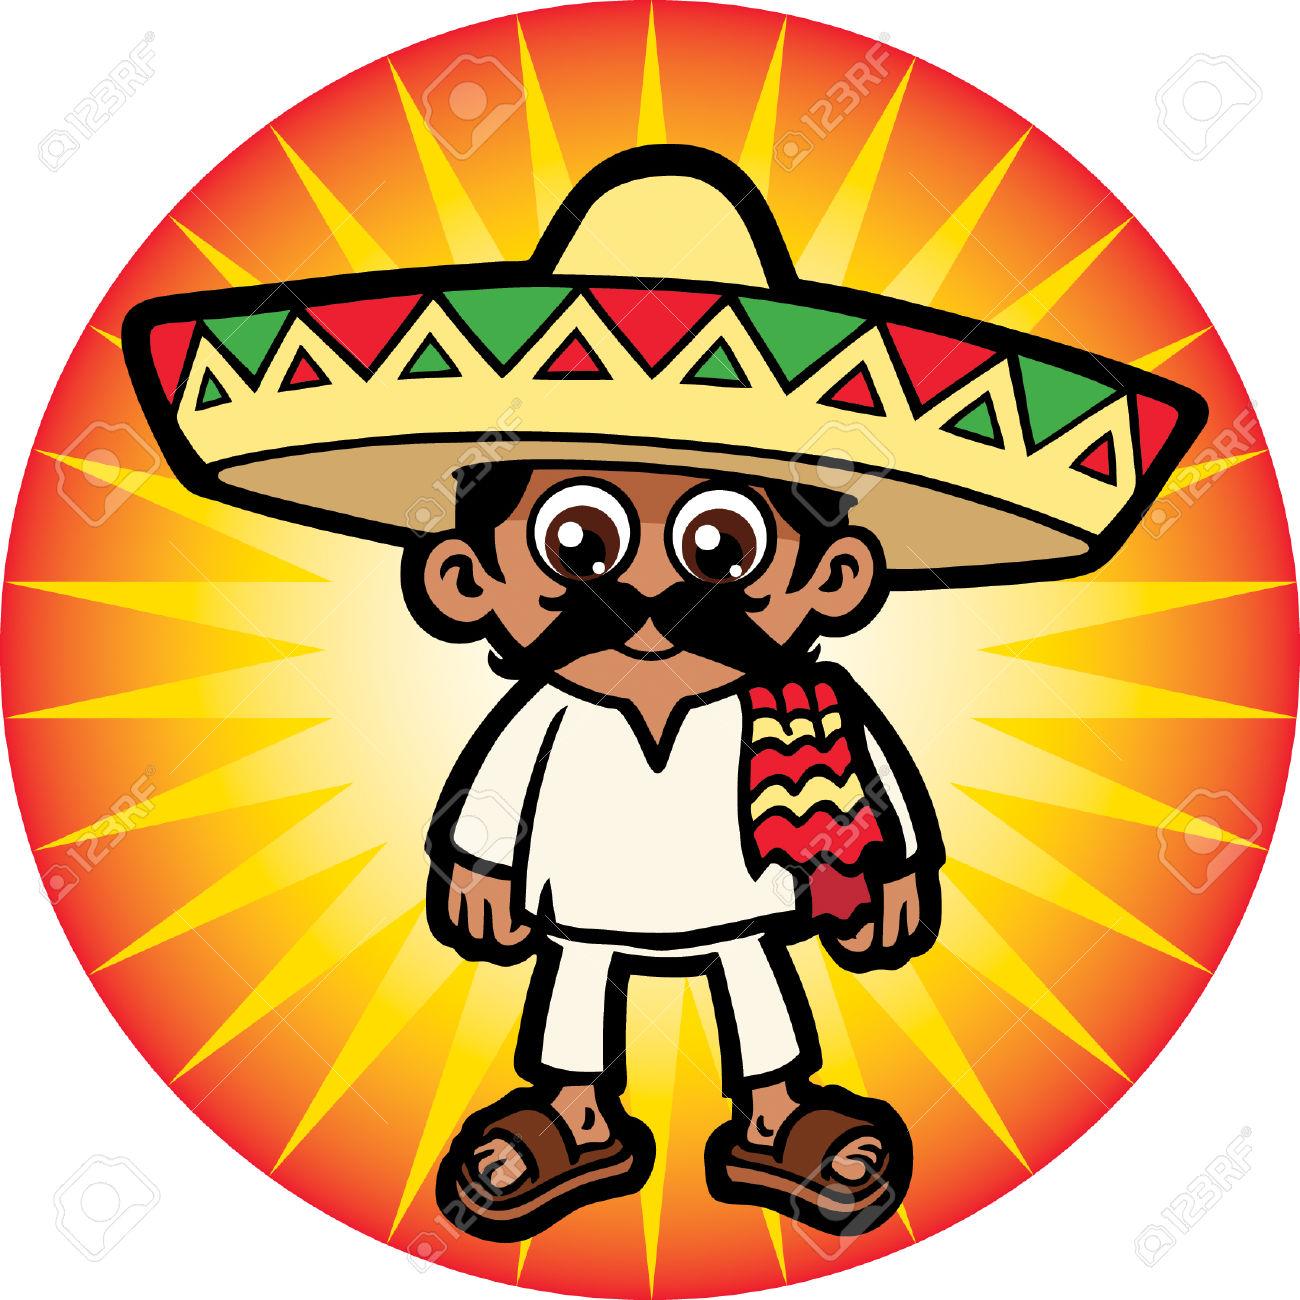 hight resolution of 1300x1300 24304976 mexican man stock vector mexican sombrero cartoon jpg